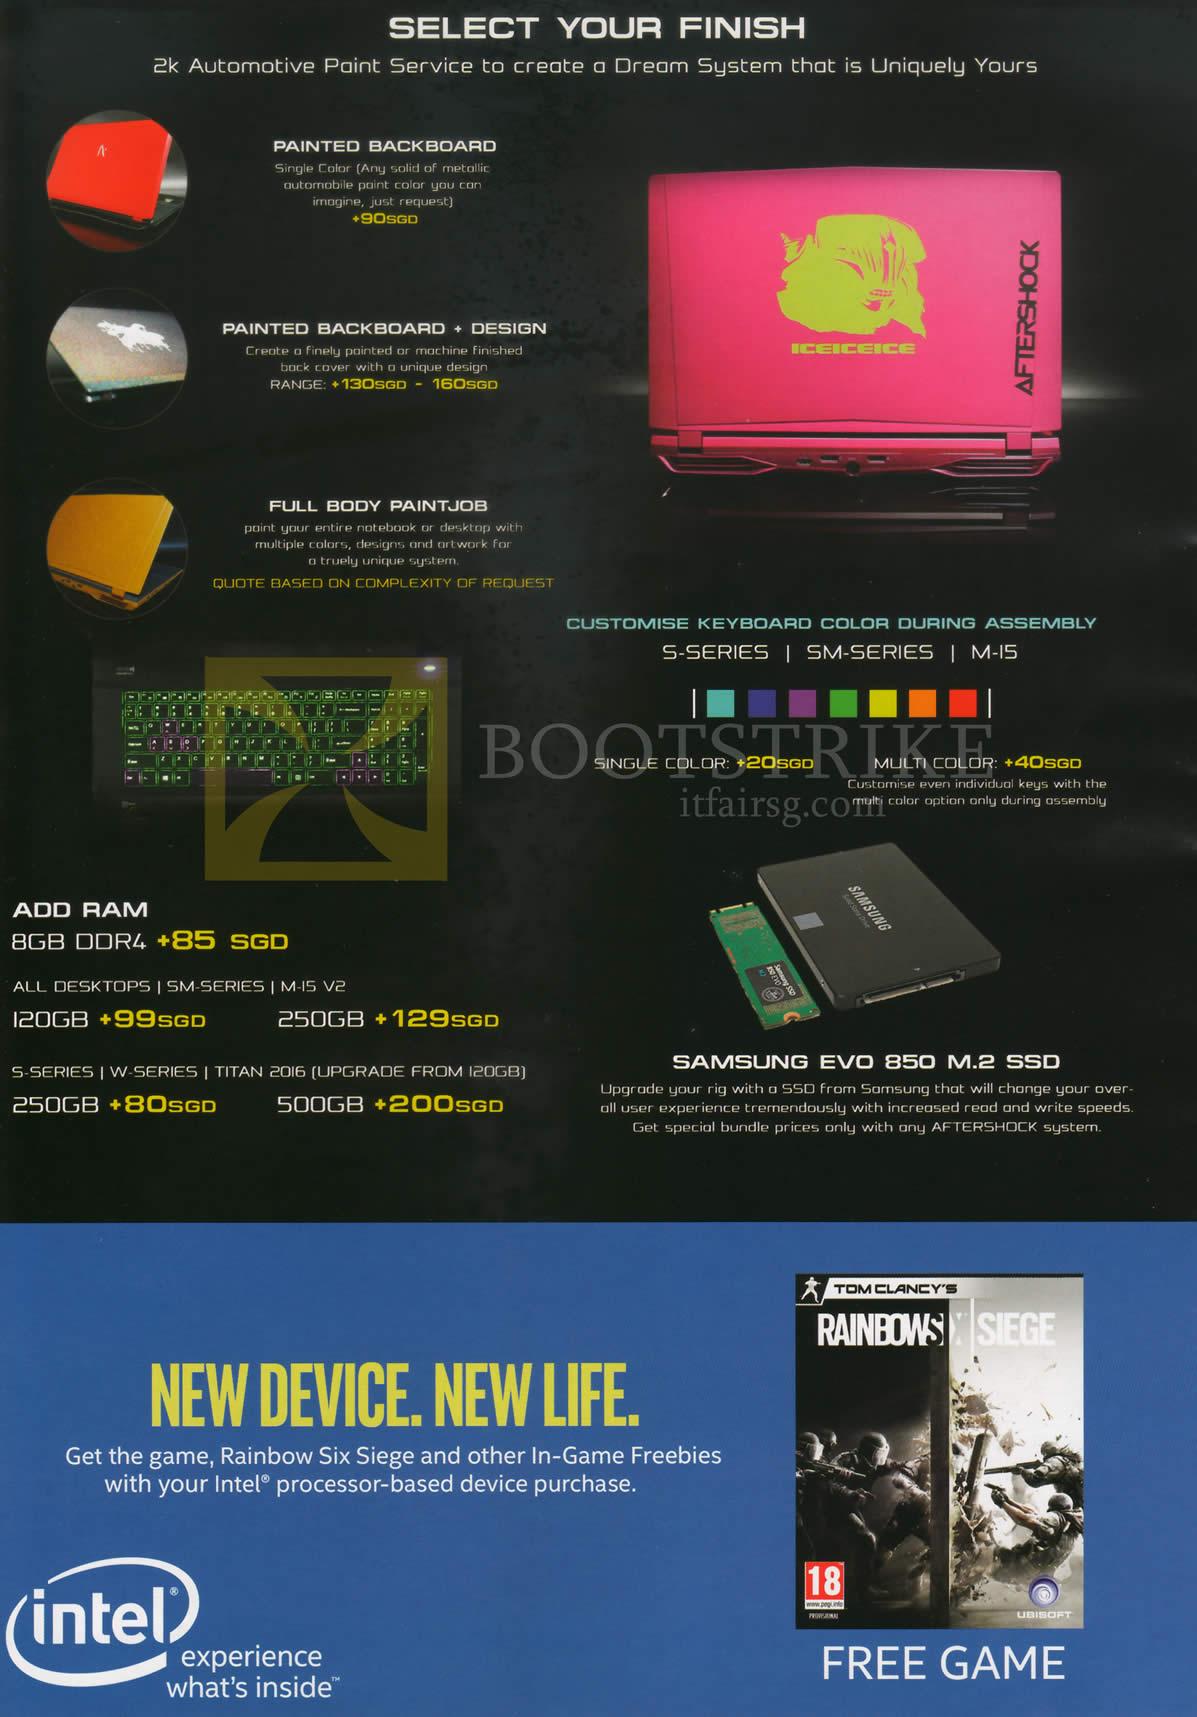 PC SHOW 2016 price list image brochure of Aftershock Notebook Customisation, Finish, RAM, SSD Evo 850 M